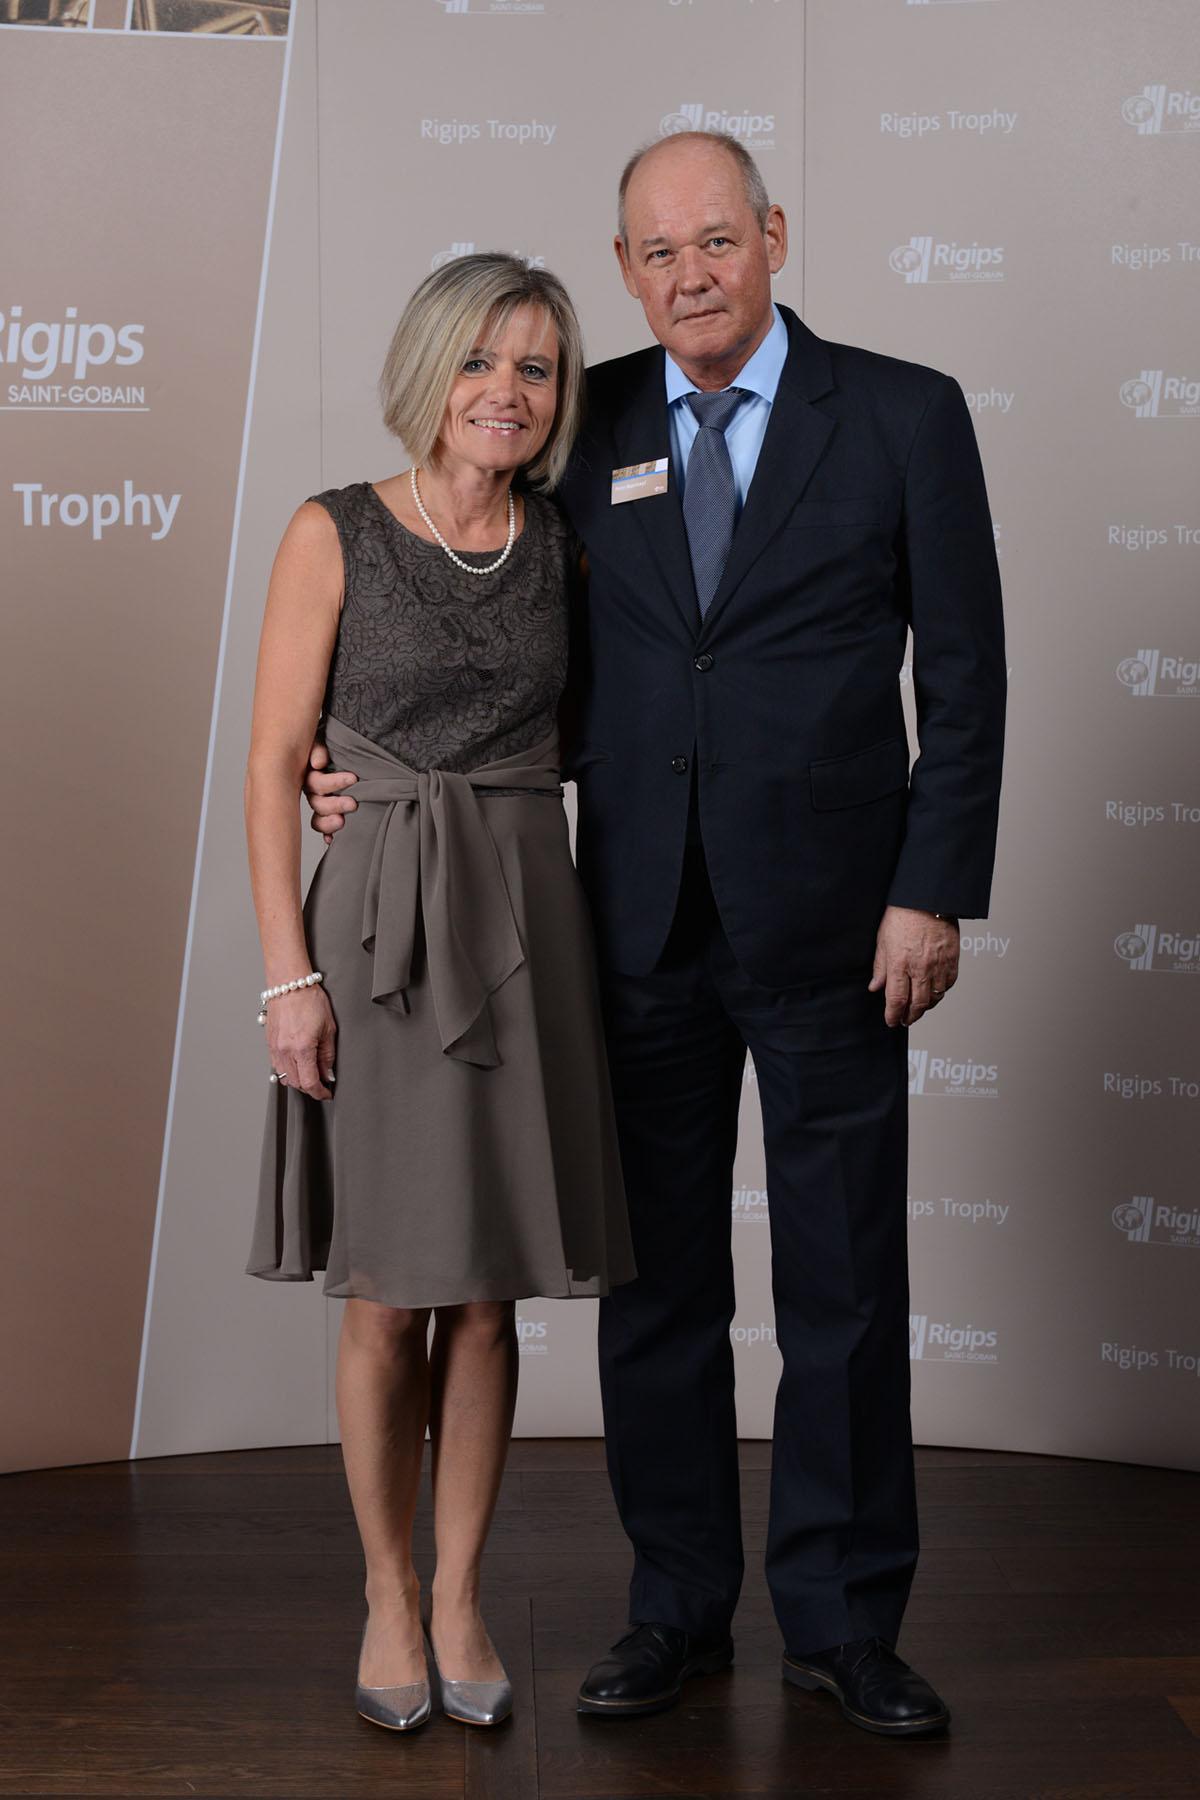 Rigips Trophy 16_0101